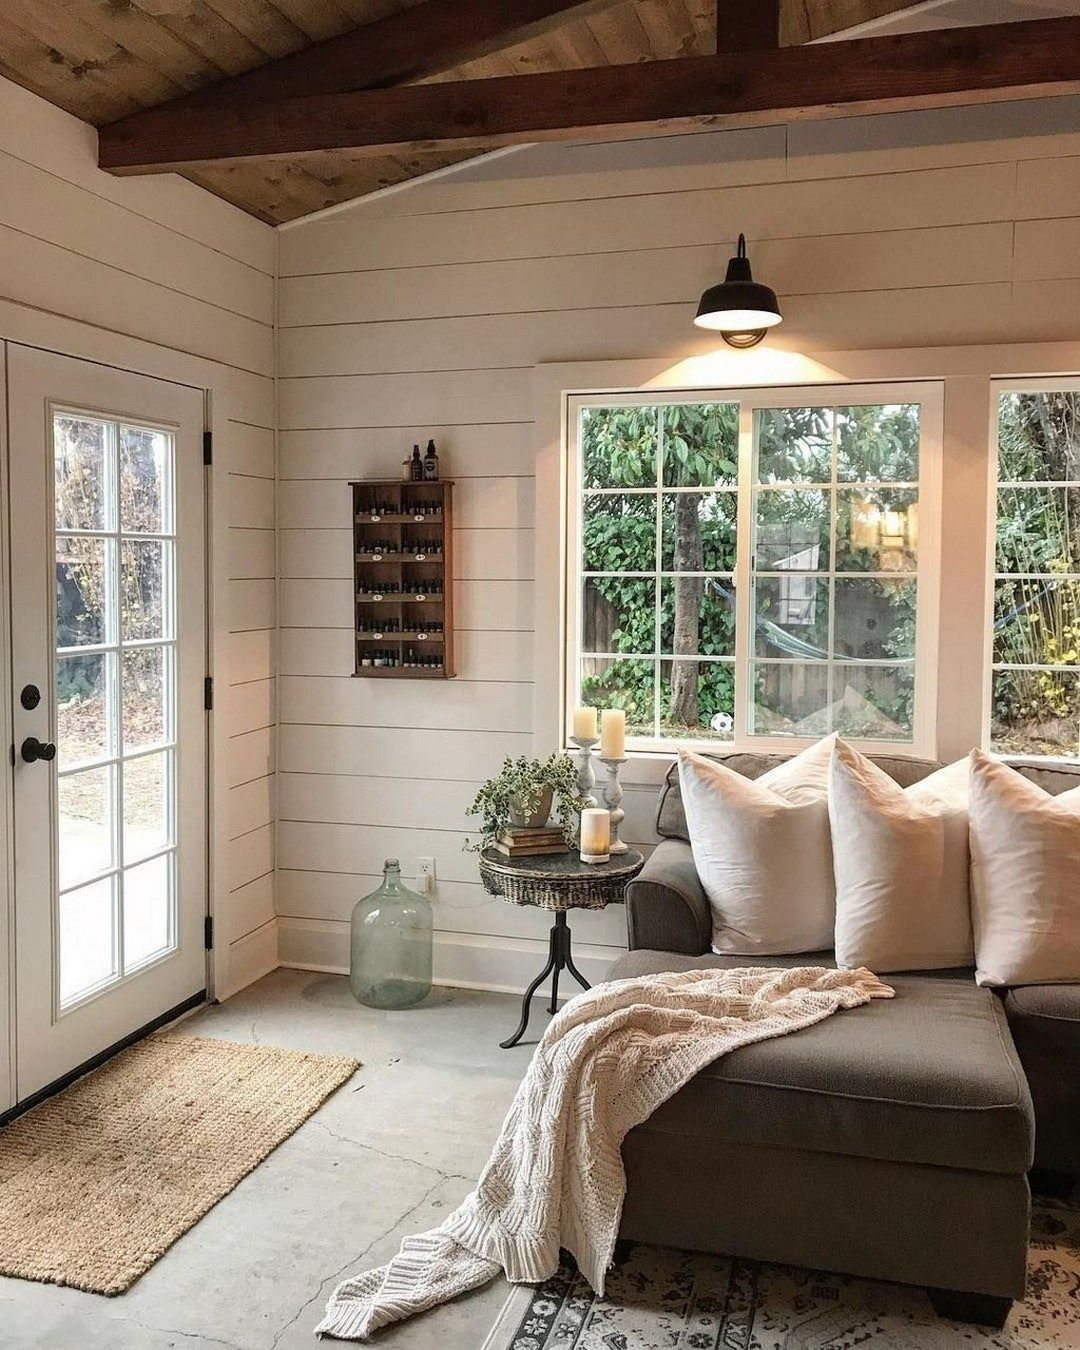 Cozy Modern Farmhouse Sunroom Design Ideas (6 Sunroom